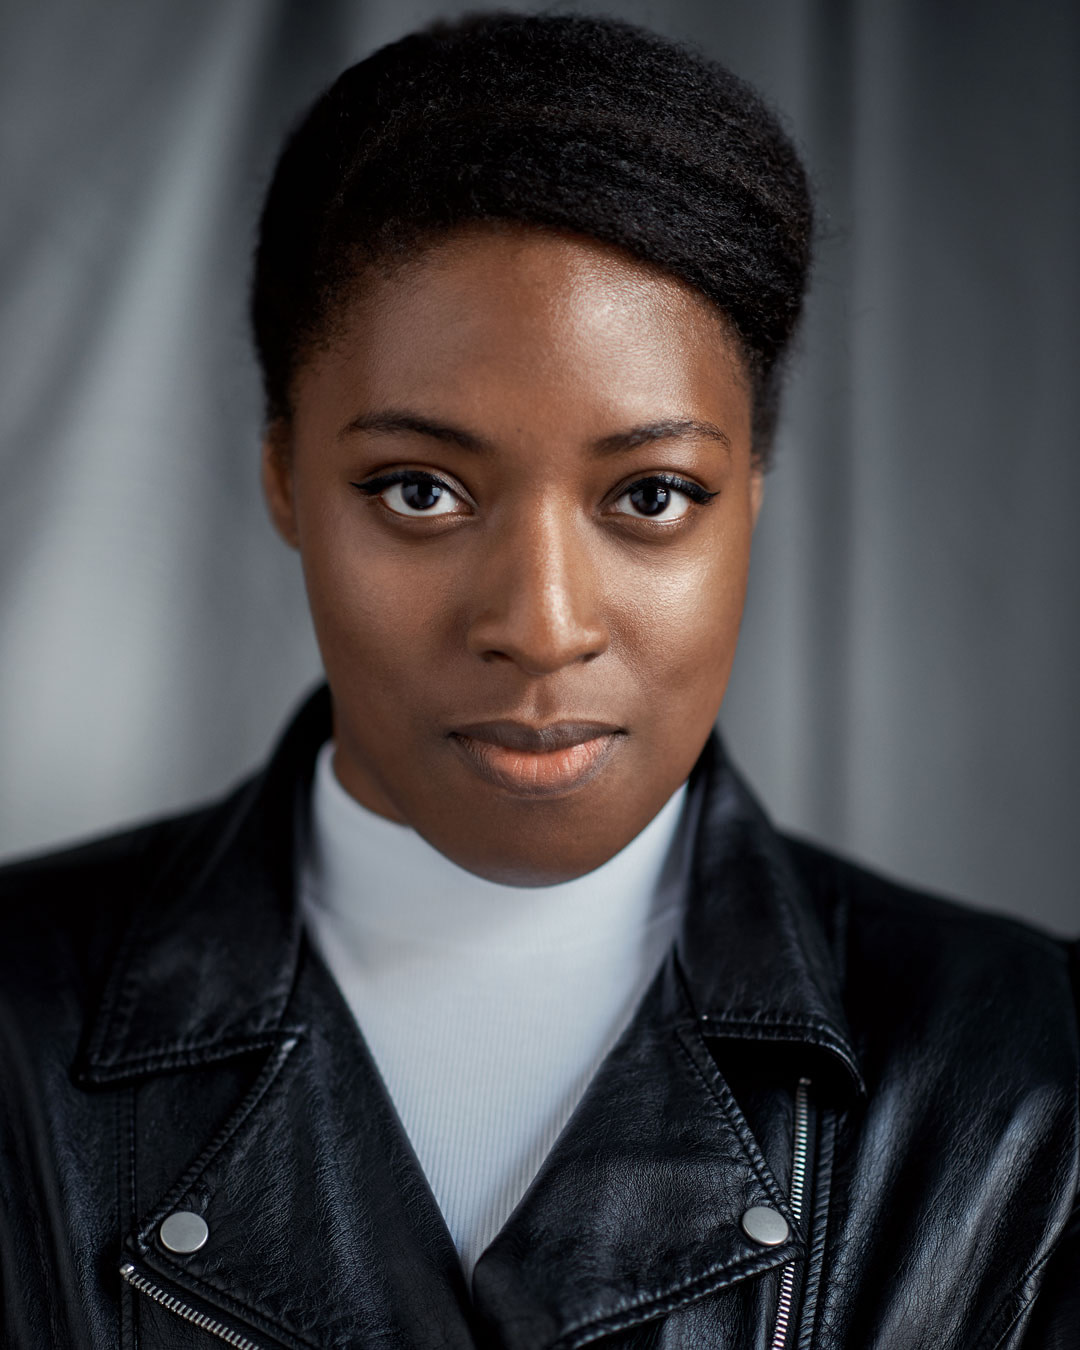 Dorcas-A-Stevens-Actor-April-Alexander-Photography-2020-WEB